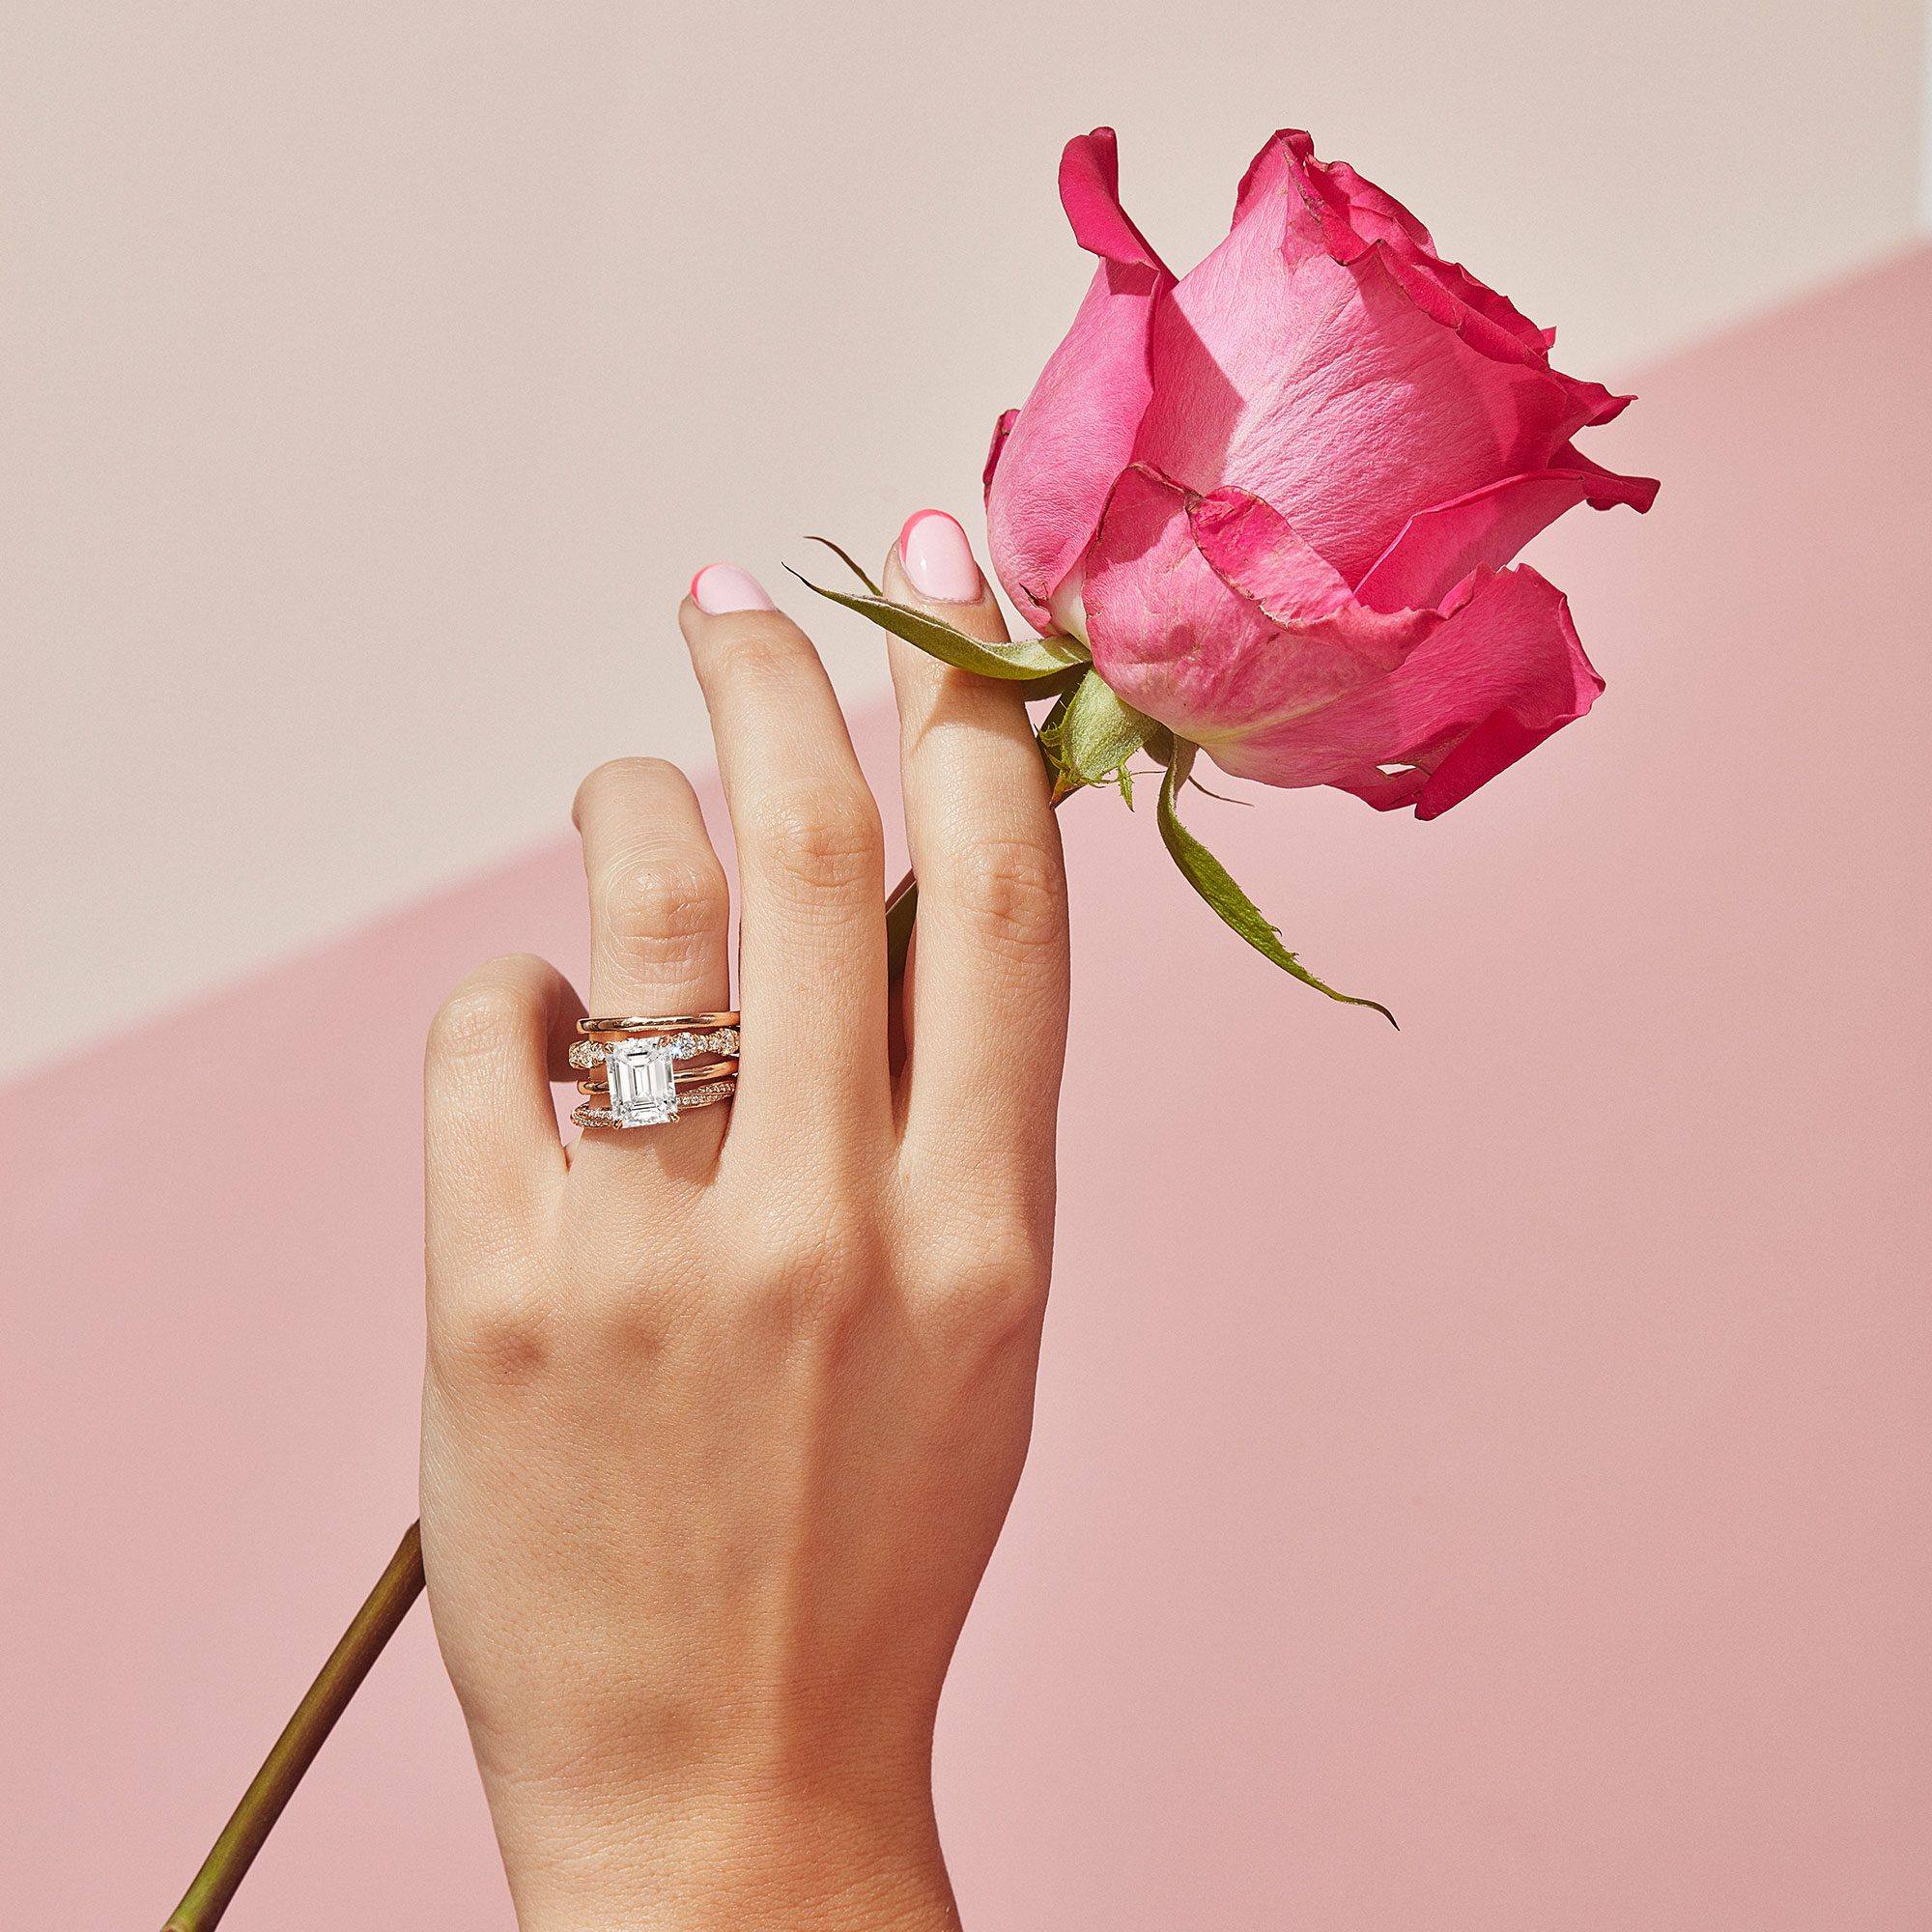 Colette Emerald Lab Grown Diamond Ring on Hand Model